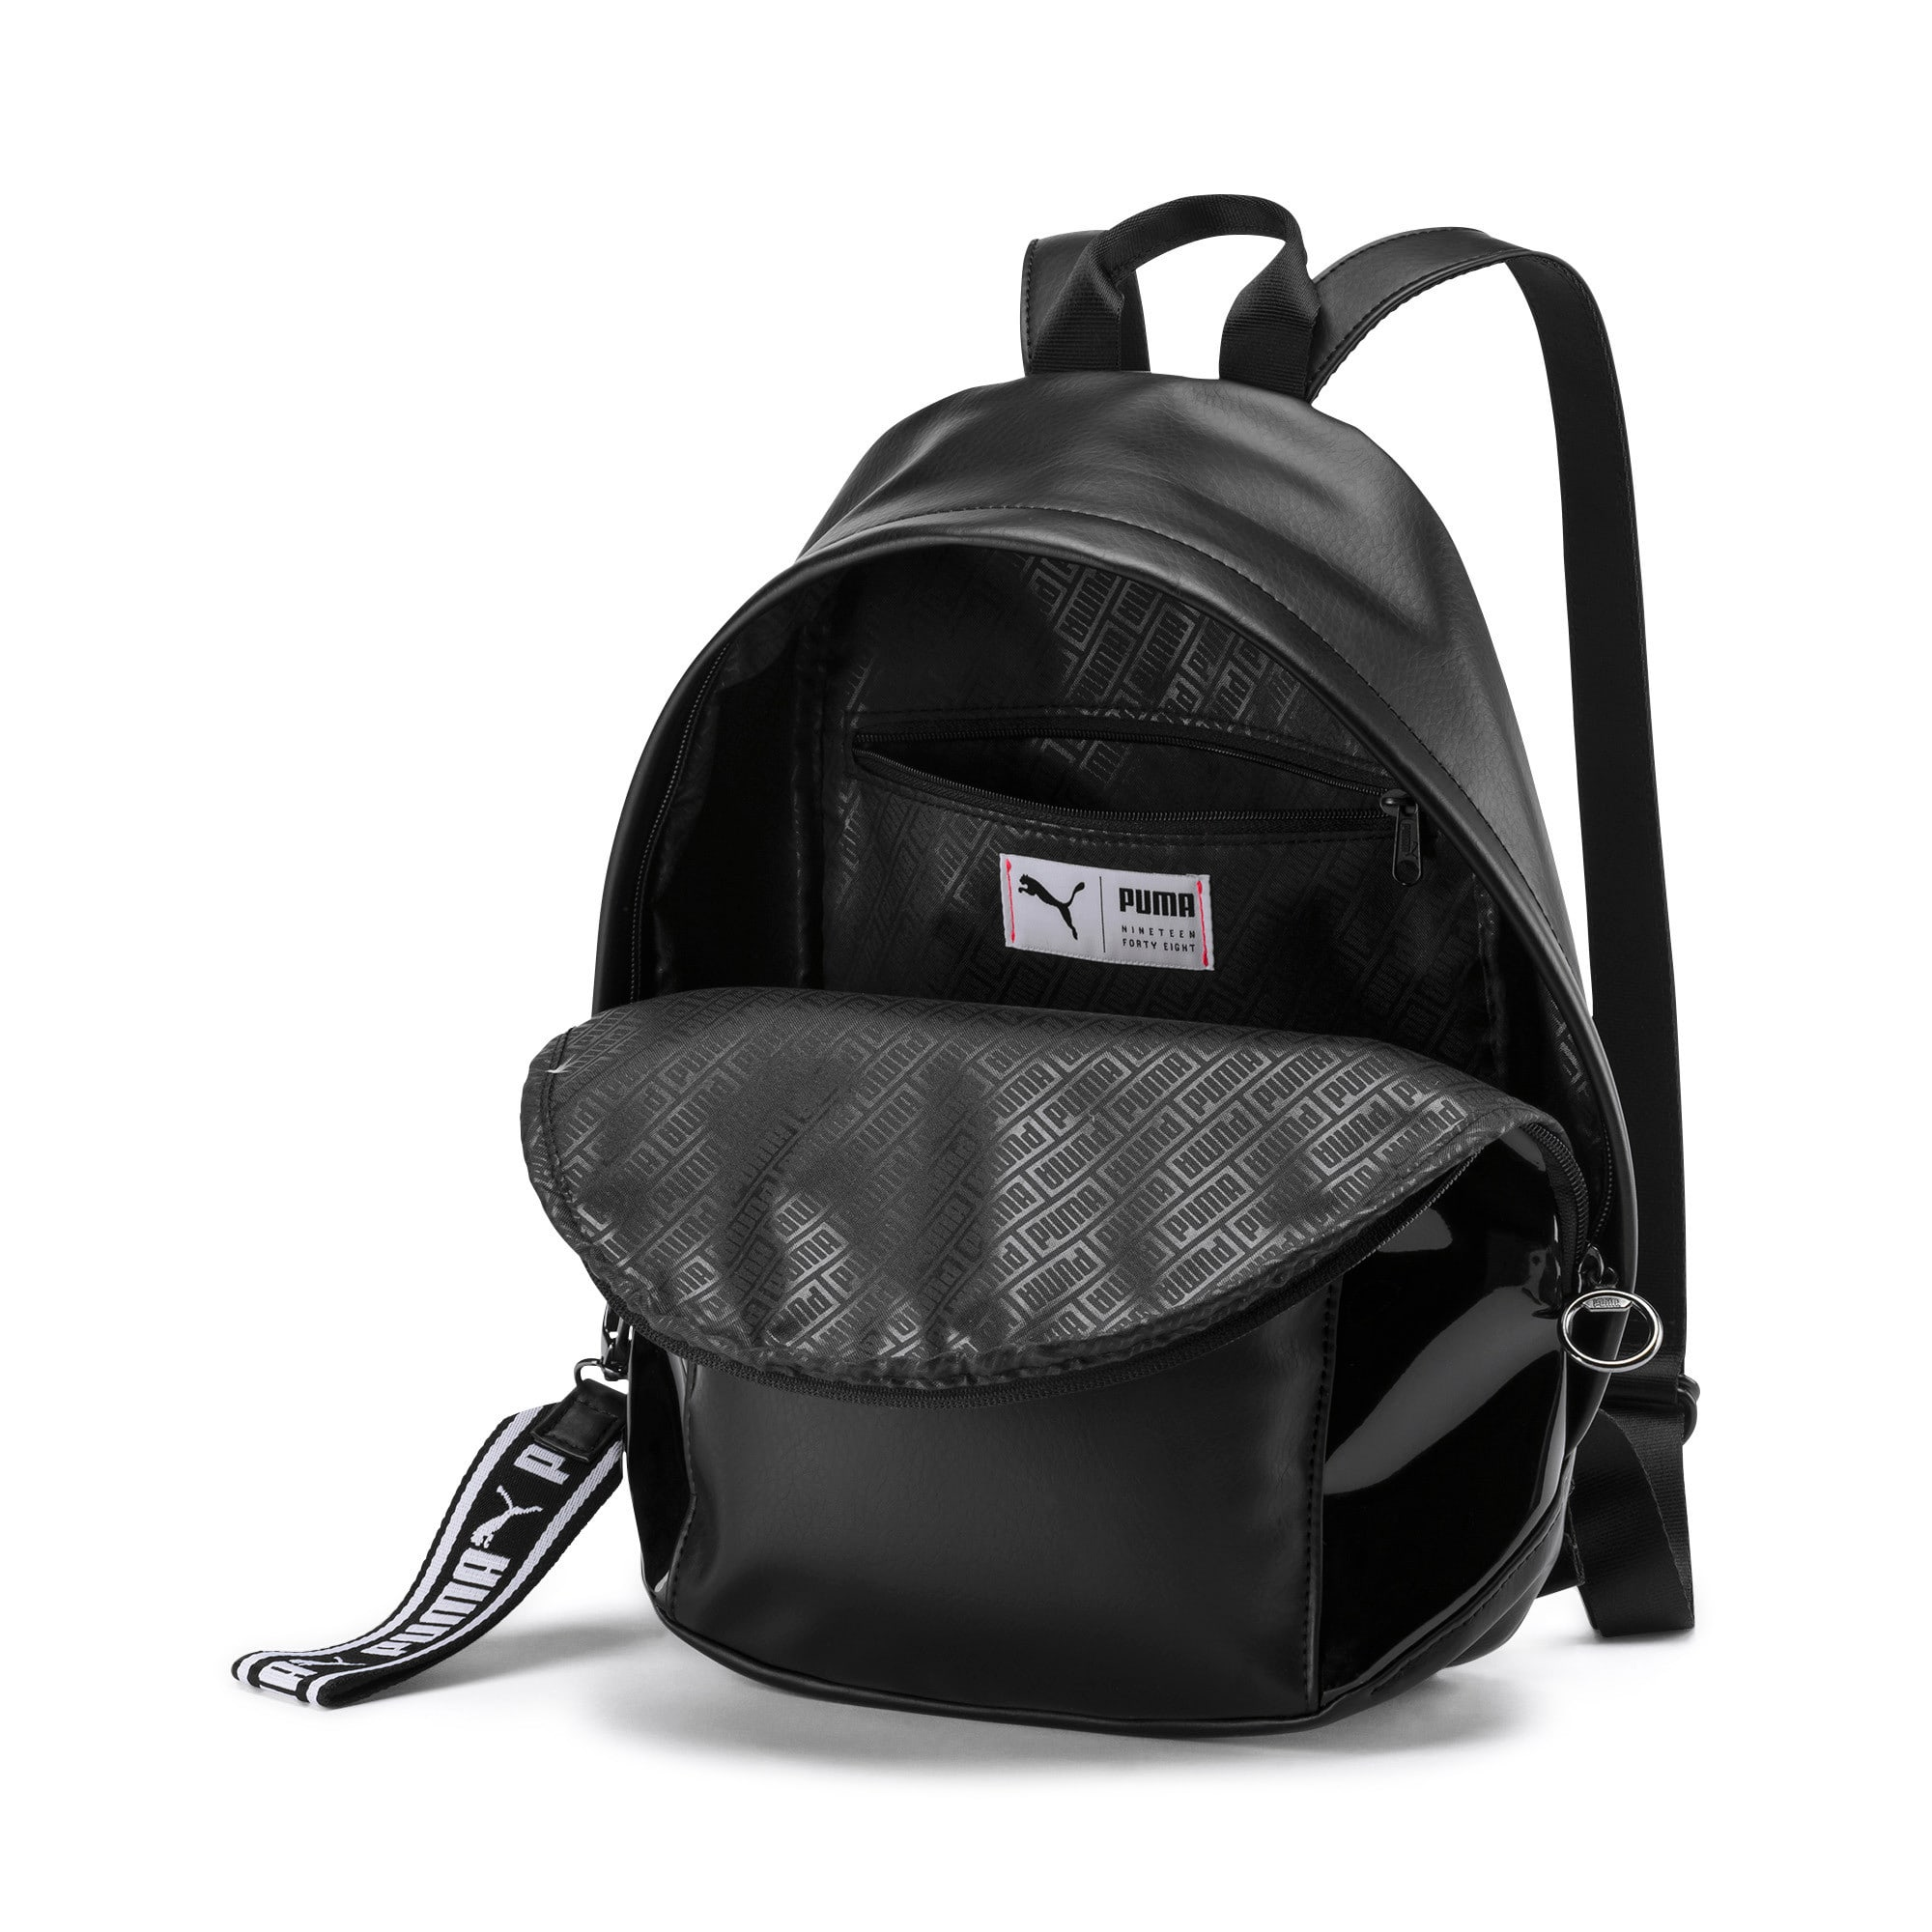 Thumbnail 4 of Premium Women's Backpack, Puma Black, medium-IND